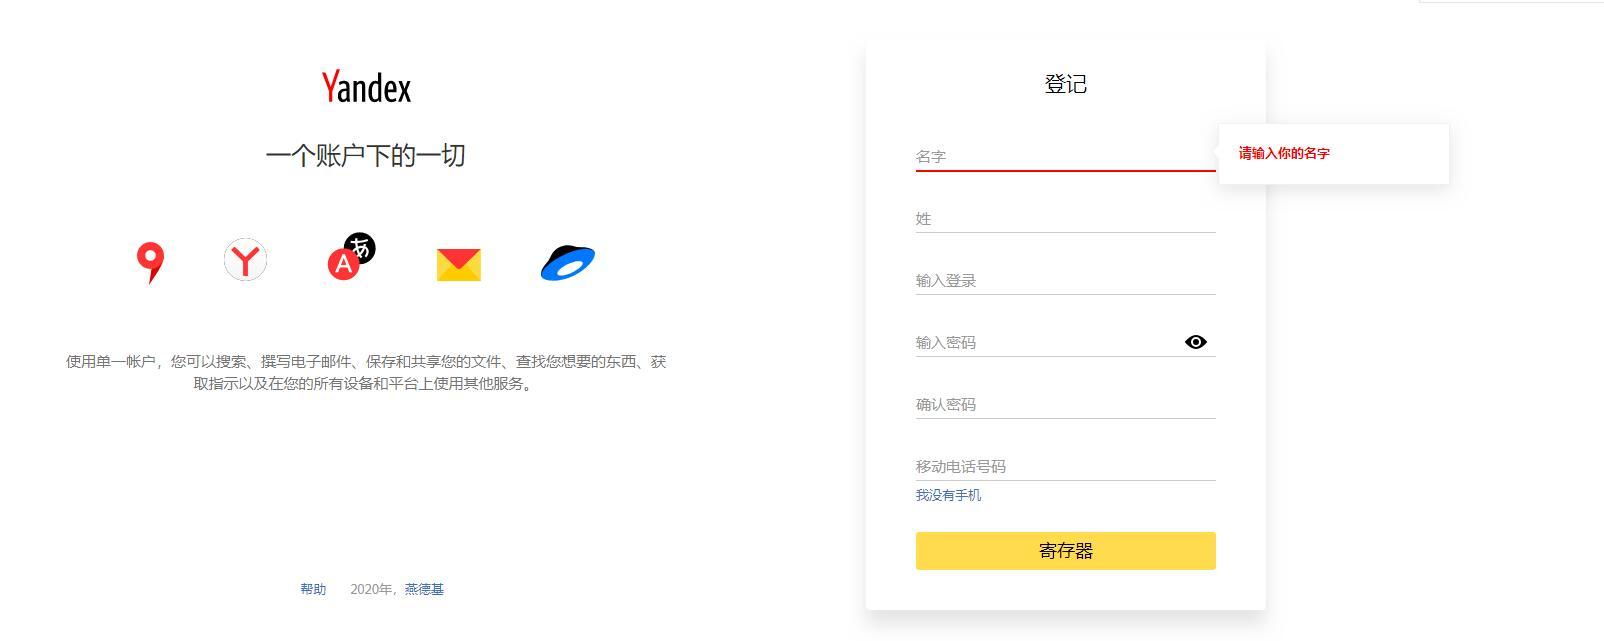 yandex – 值得分享的搜索引擎和免手机号注册邮箱